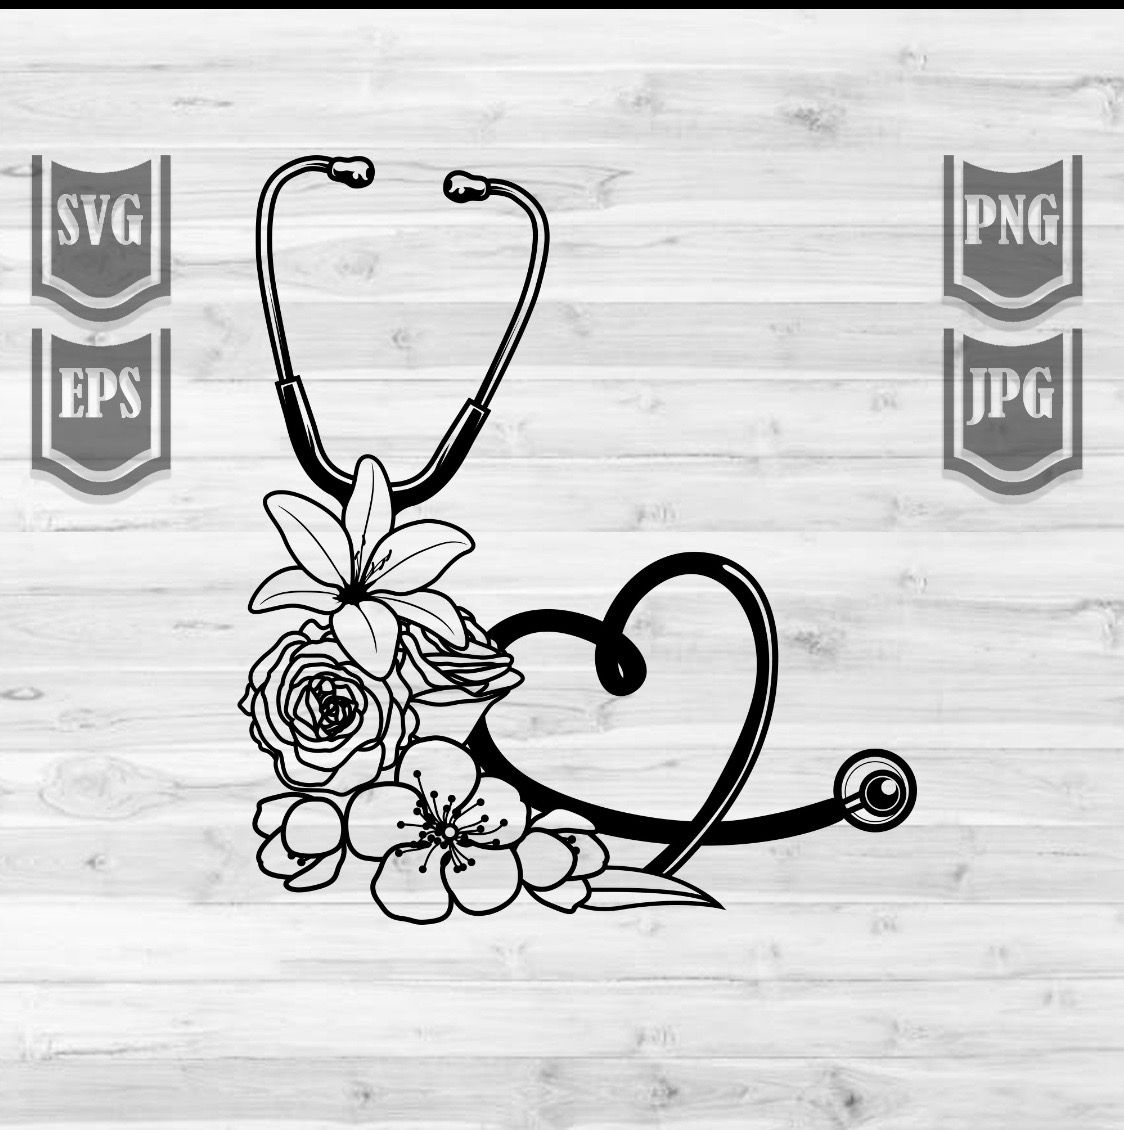 Pin by Linda Gonzalez on Creative in 2020 Eps, Nurse